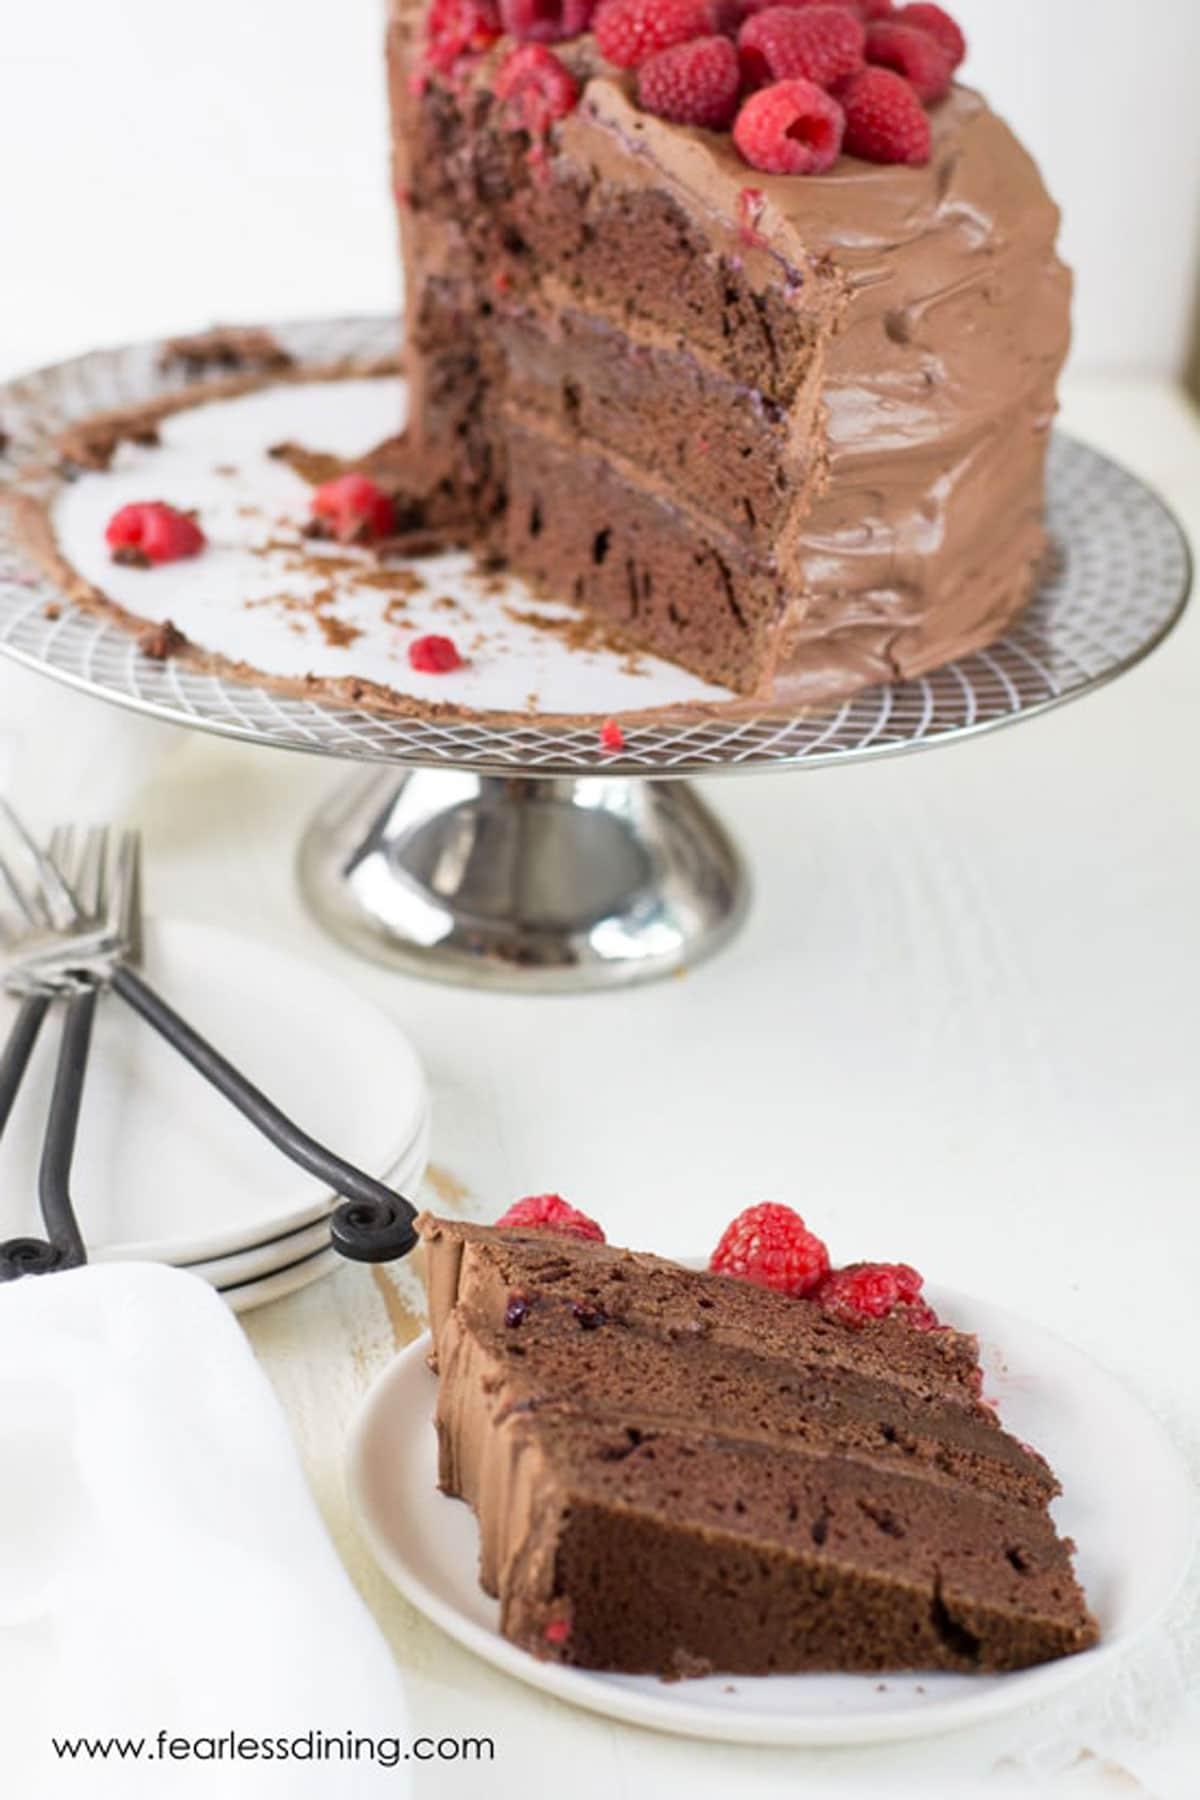 a slice of chocolate raspberry cake on a white plate